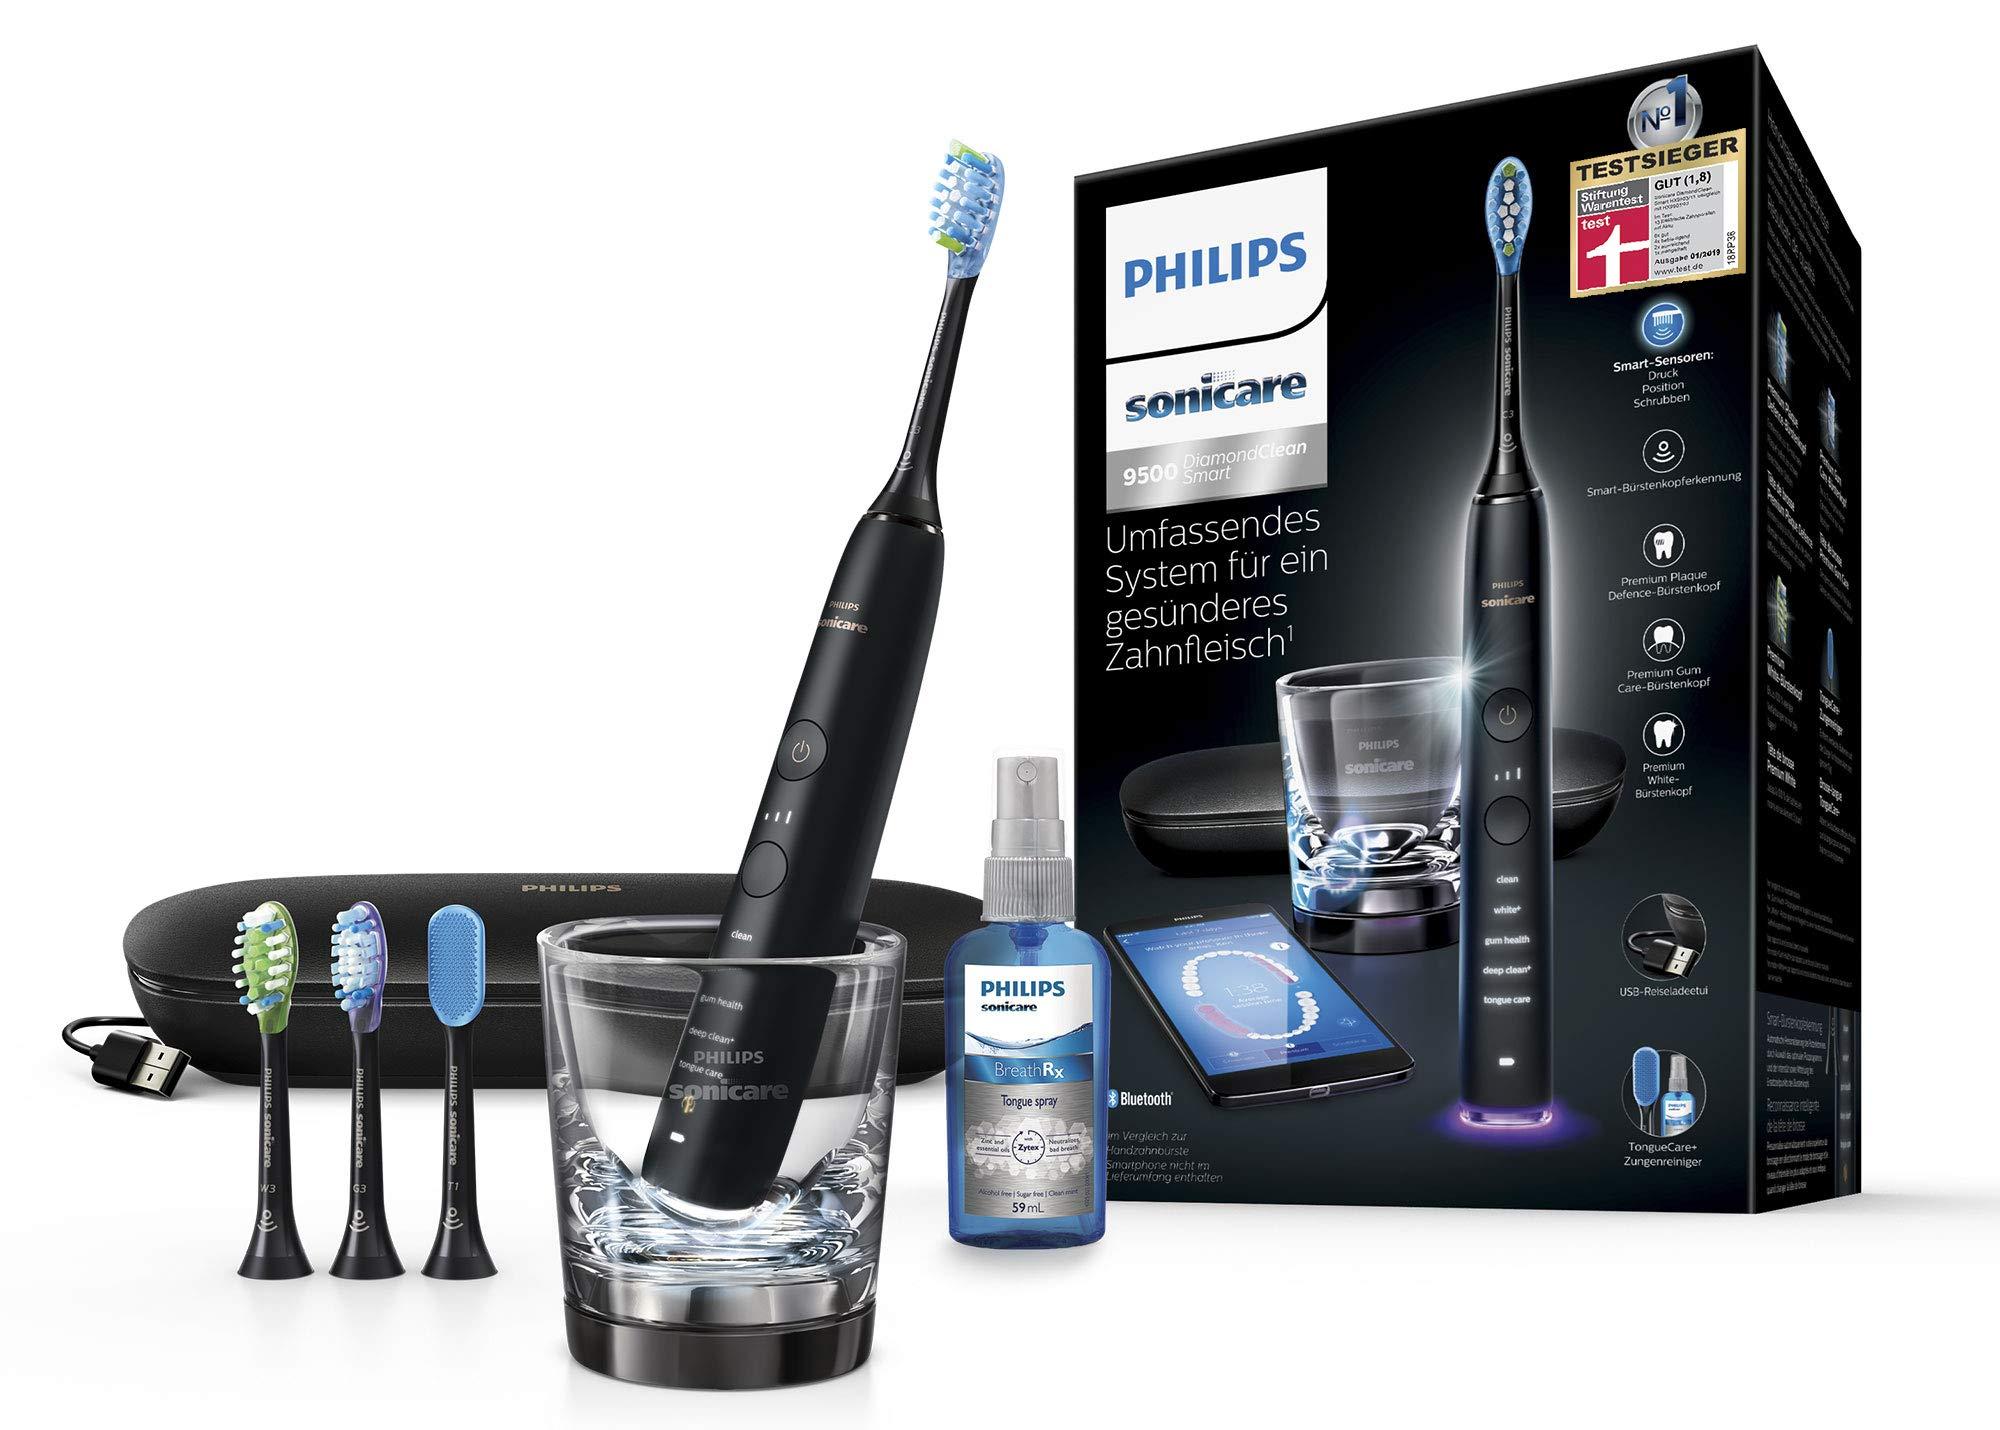 Philips 飞利浦 Sonicare 钻石清洁智能声波牙刷 HX9924/13,具有5个清洁程序,3个强度,充电玻璃杯,USB旅行盒和4个刷头,压力传感器可进行温和清洁 黑色